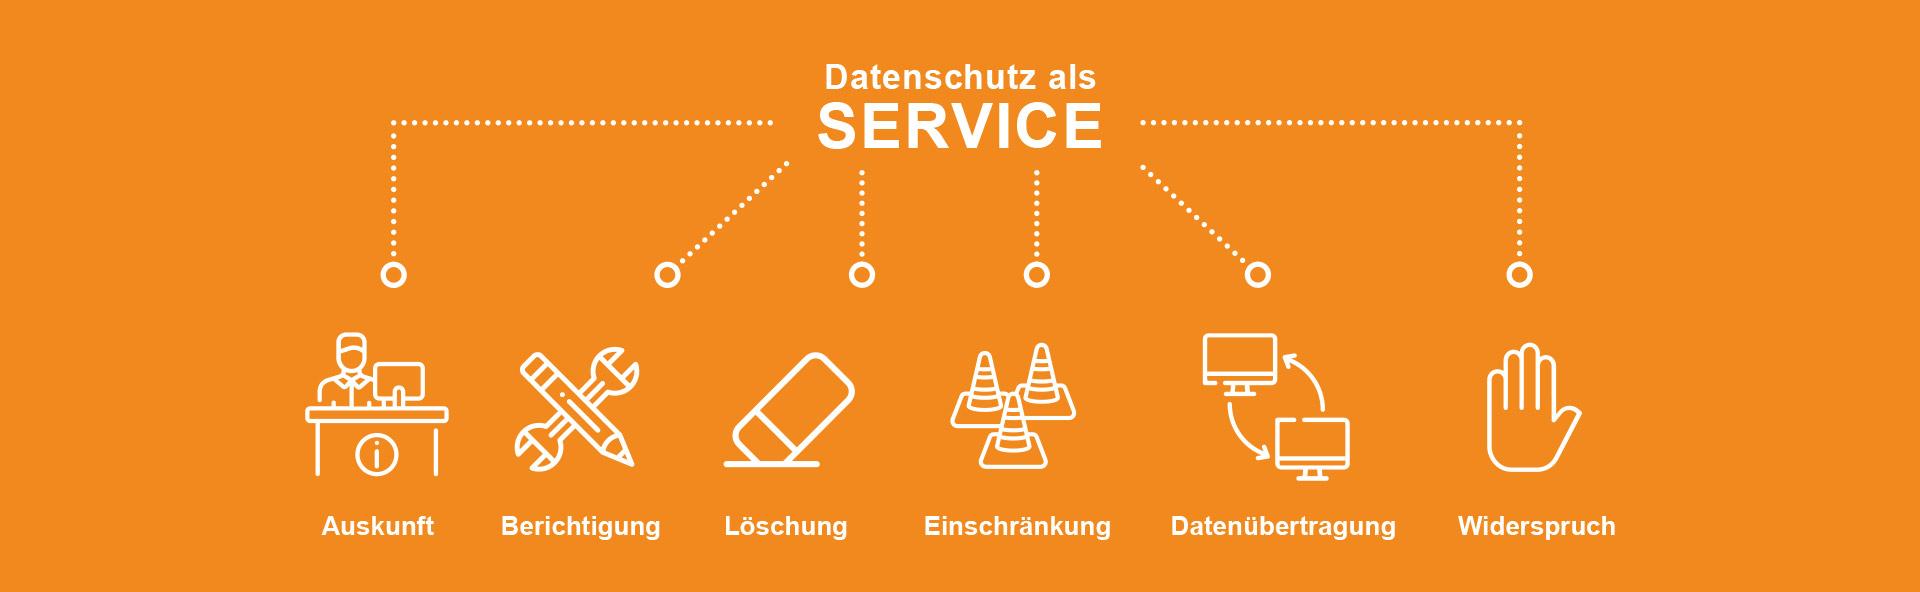 Datenschutz-als-Service